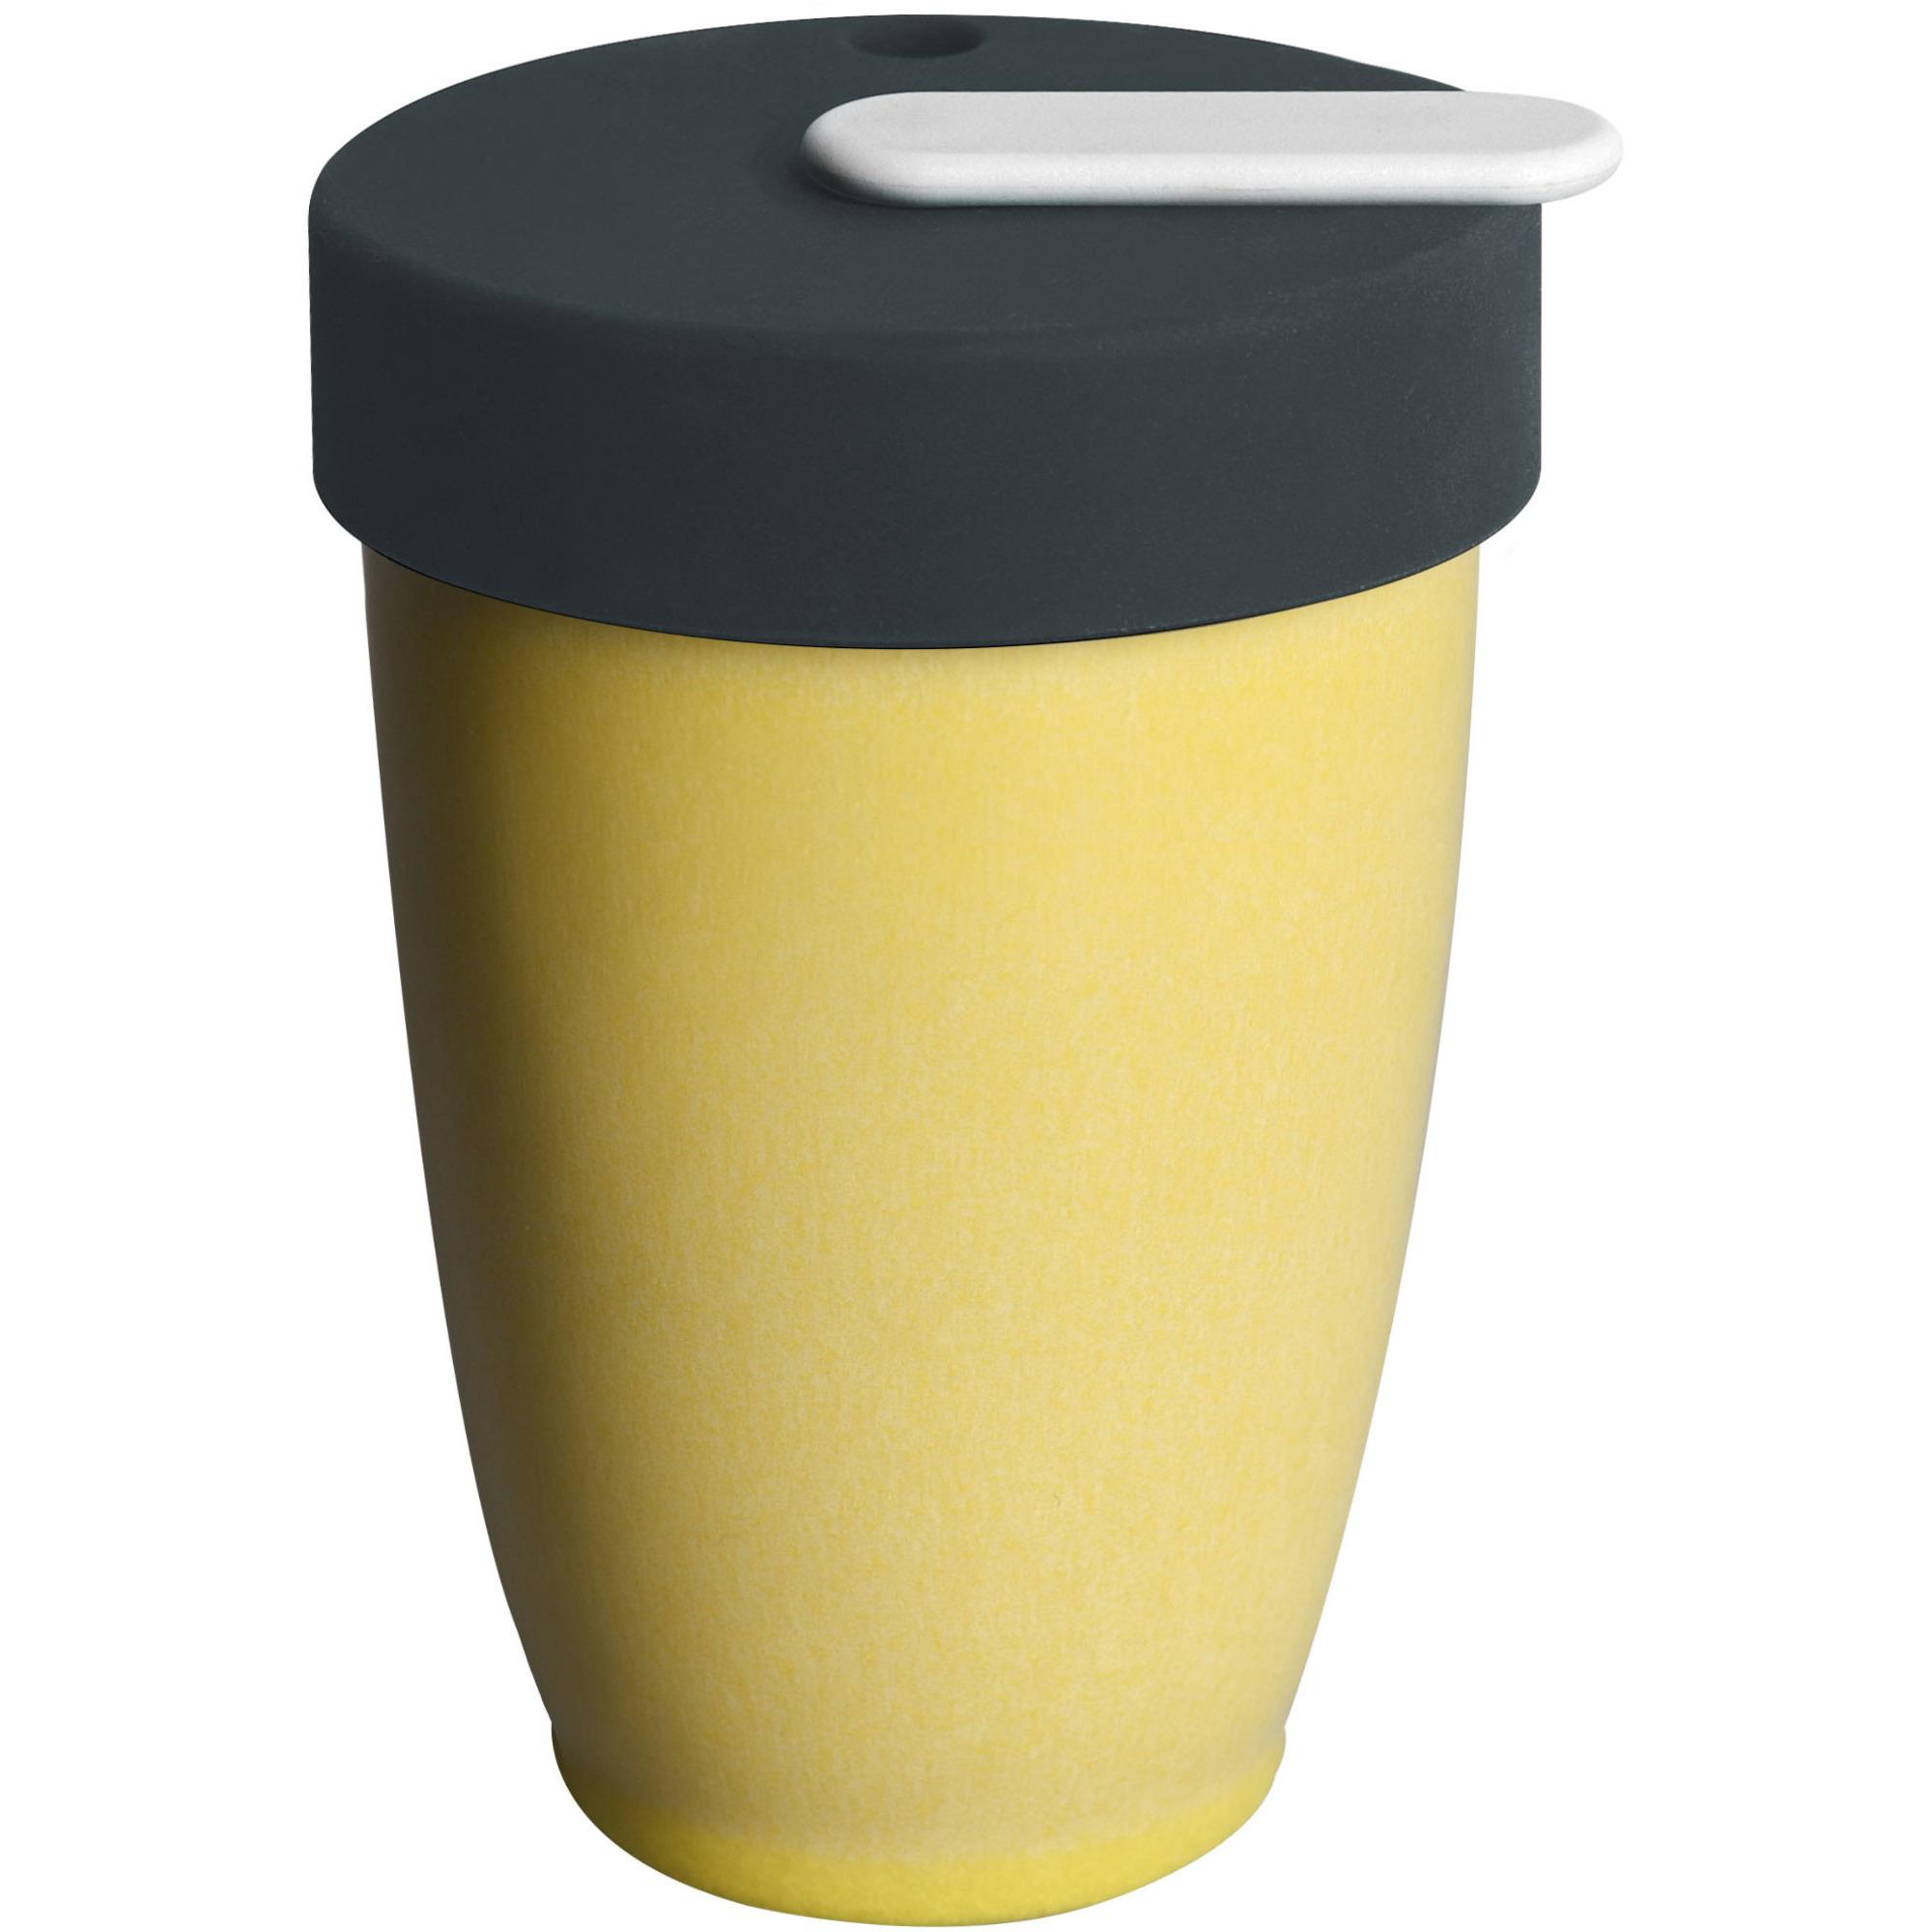 Loveramics Nomad Dubbelväggad Mugg 250 ml Butter cup